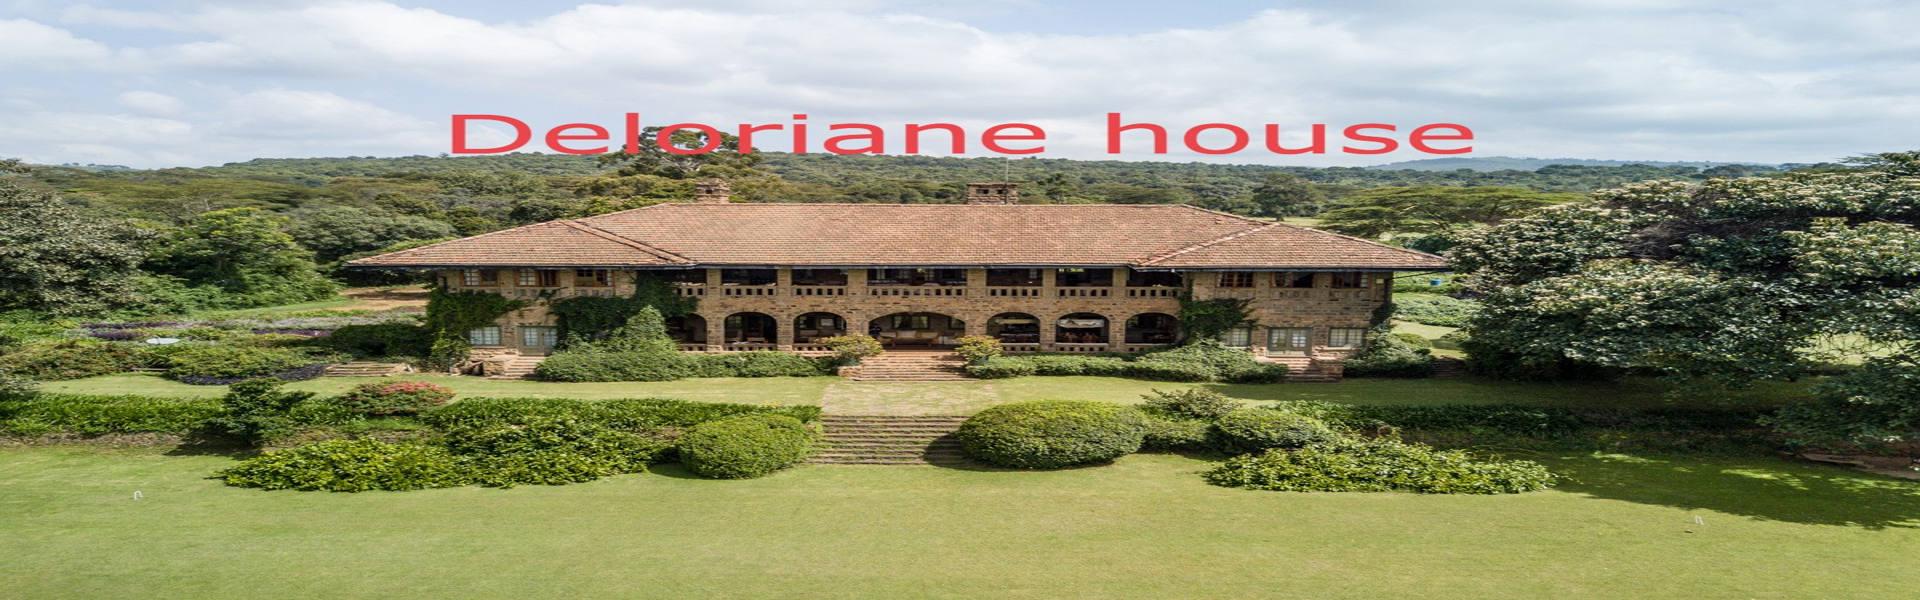 Deloriane House